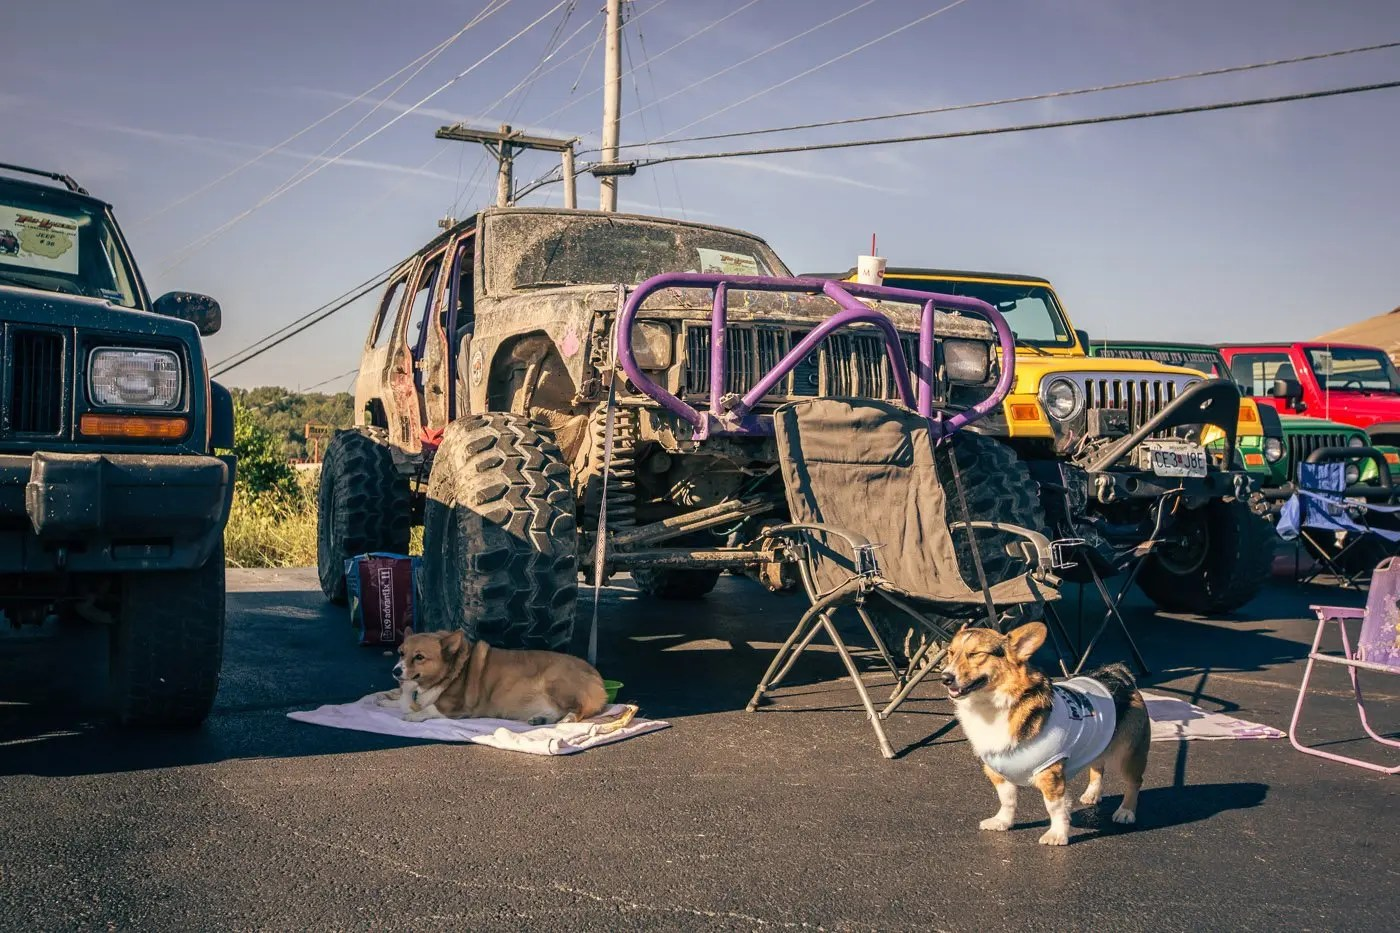 Tri lakes chrysler dodge jeep 2018 dodge reviews for Tanner motors brainerd minnesota